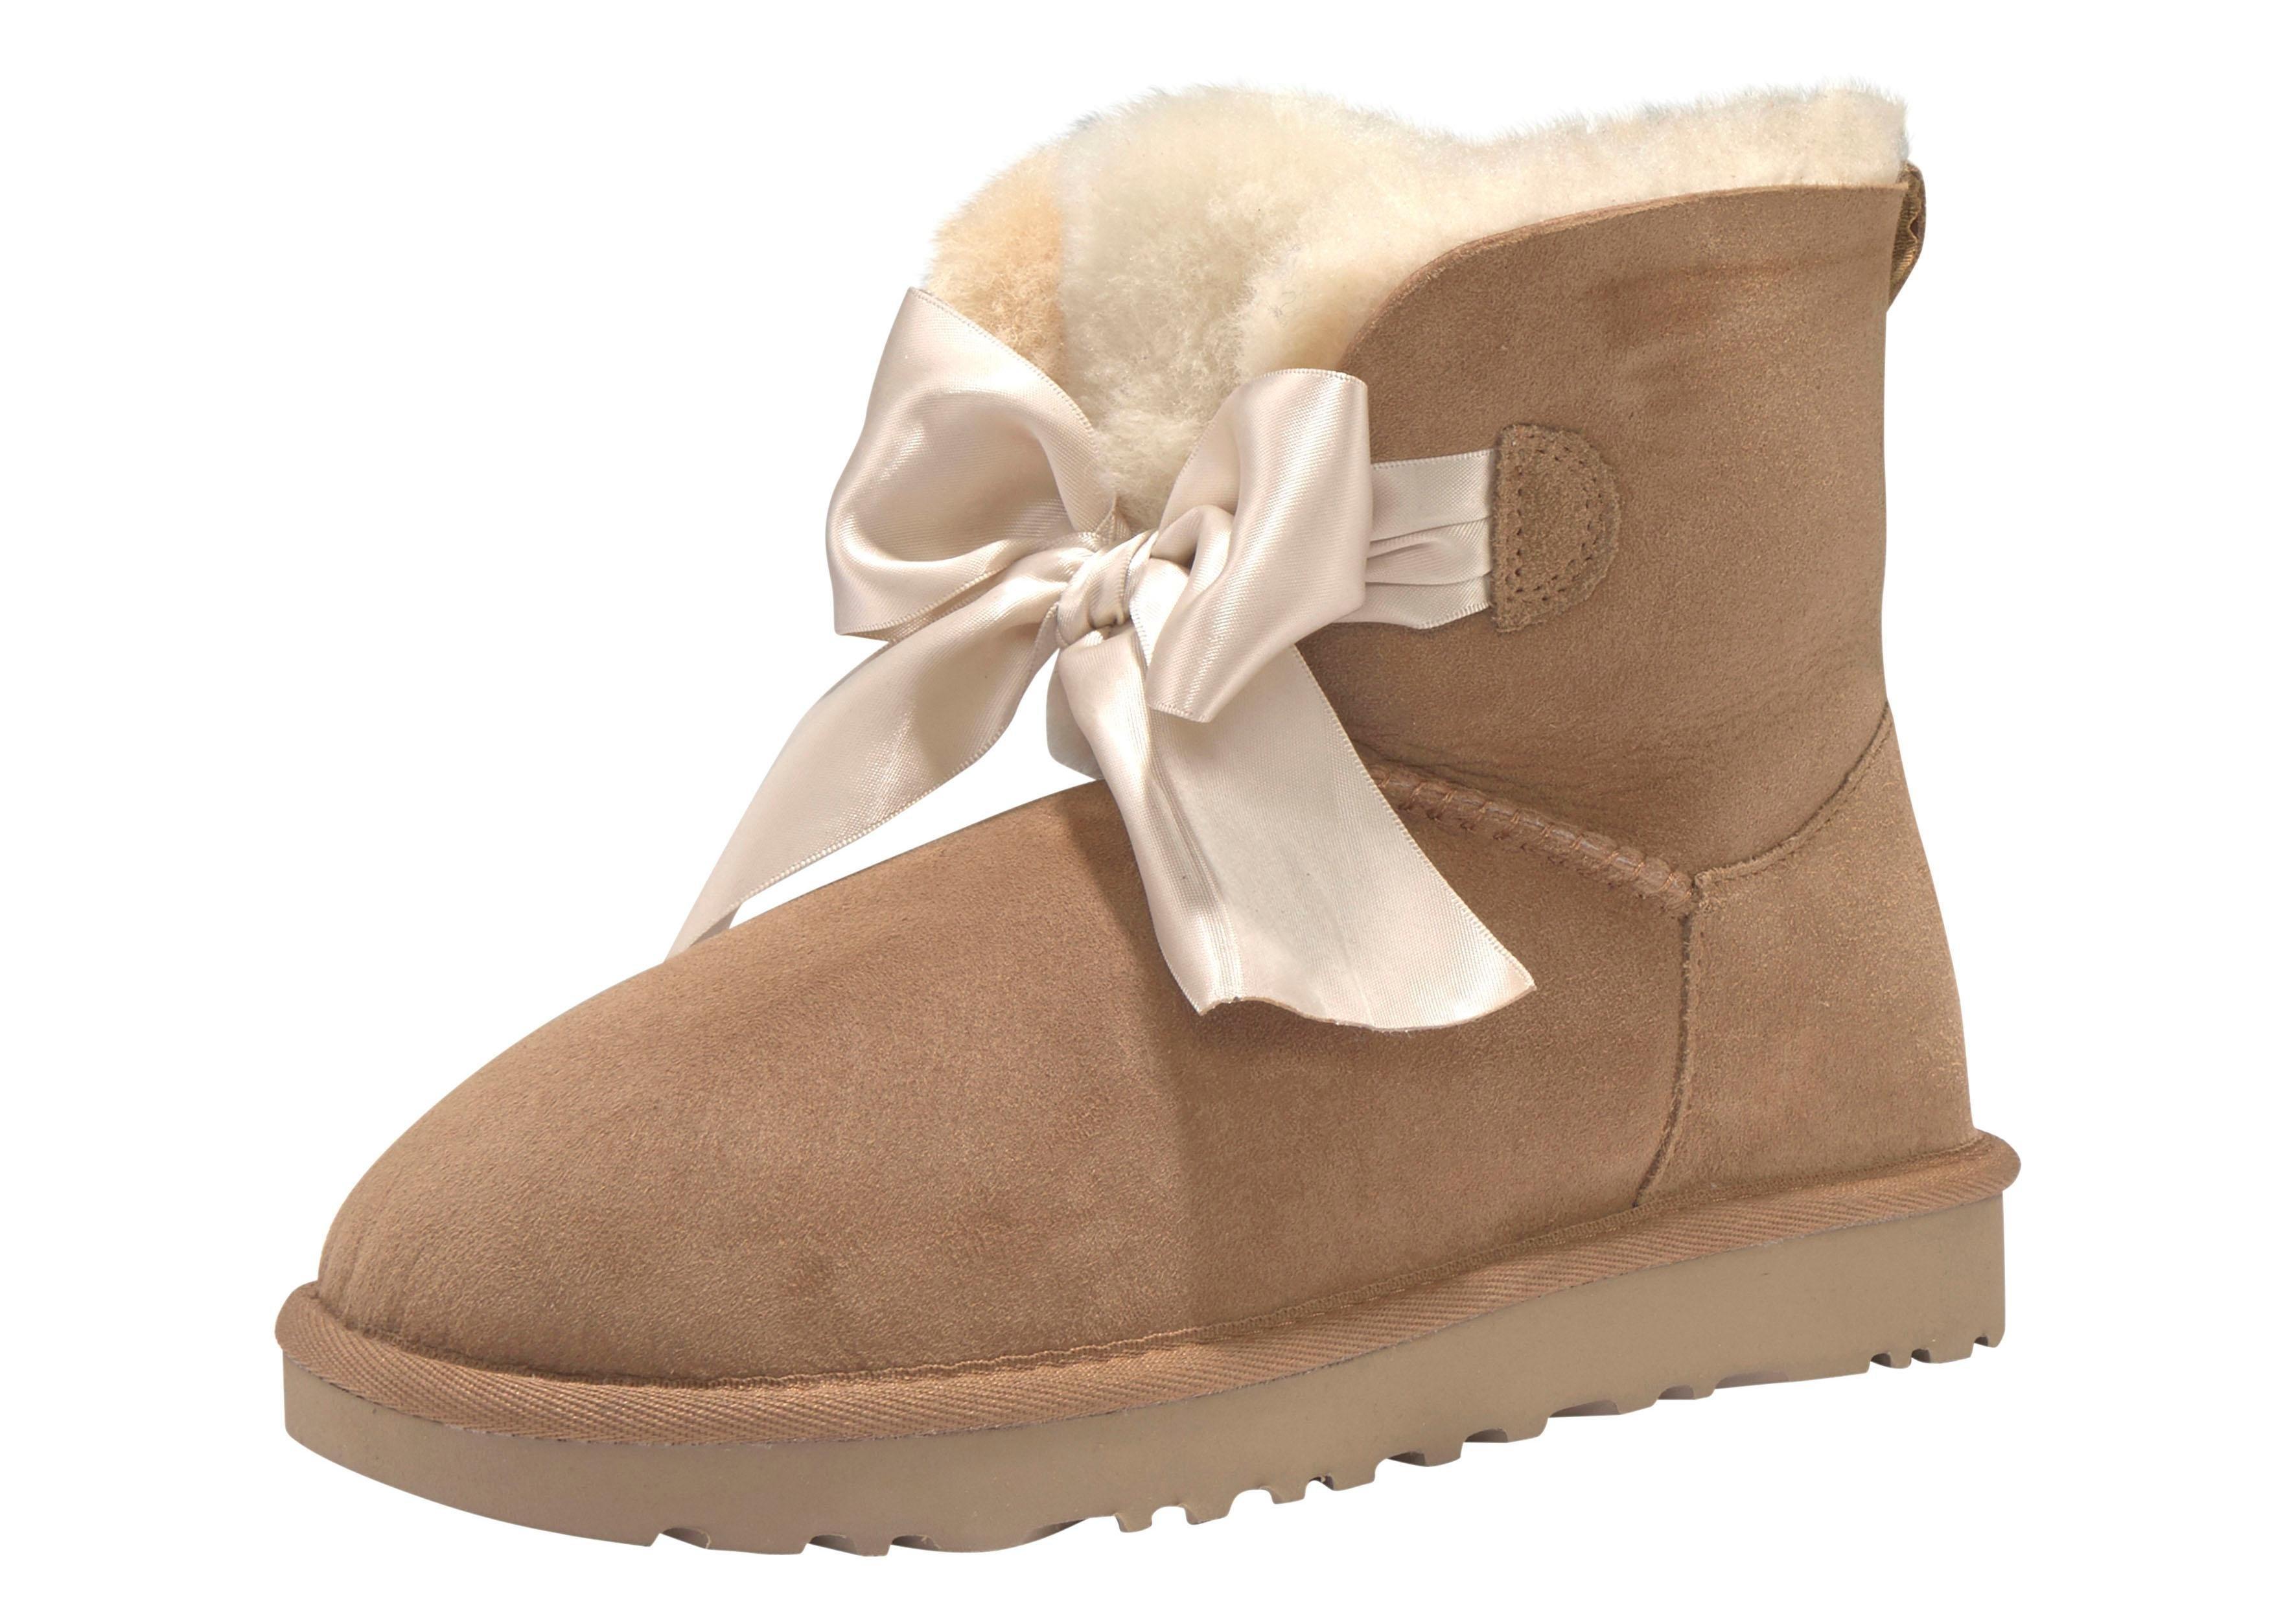 Ugg boots zonder sluiting »Gita Bow Mini« nu online bestellen